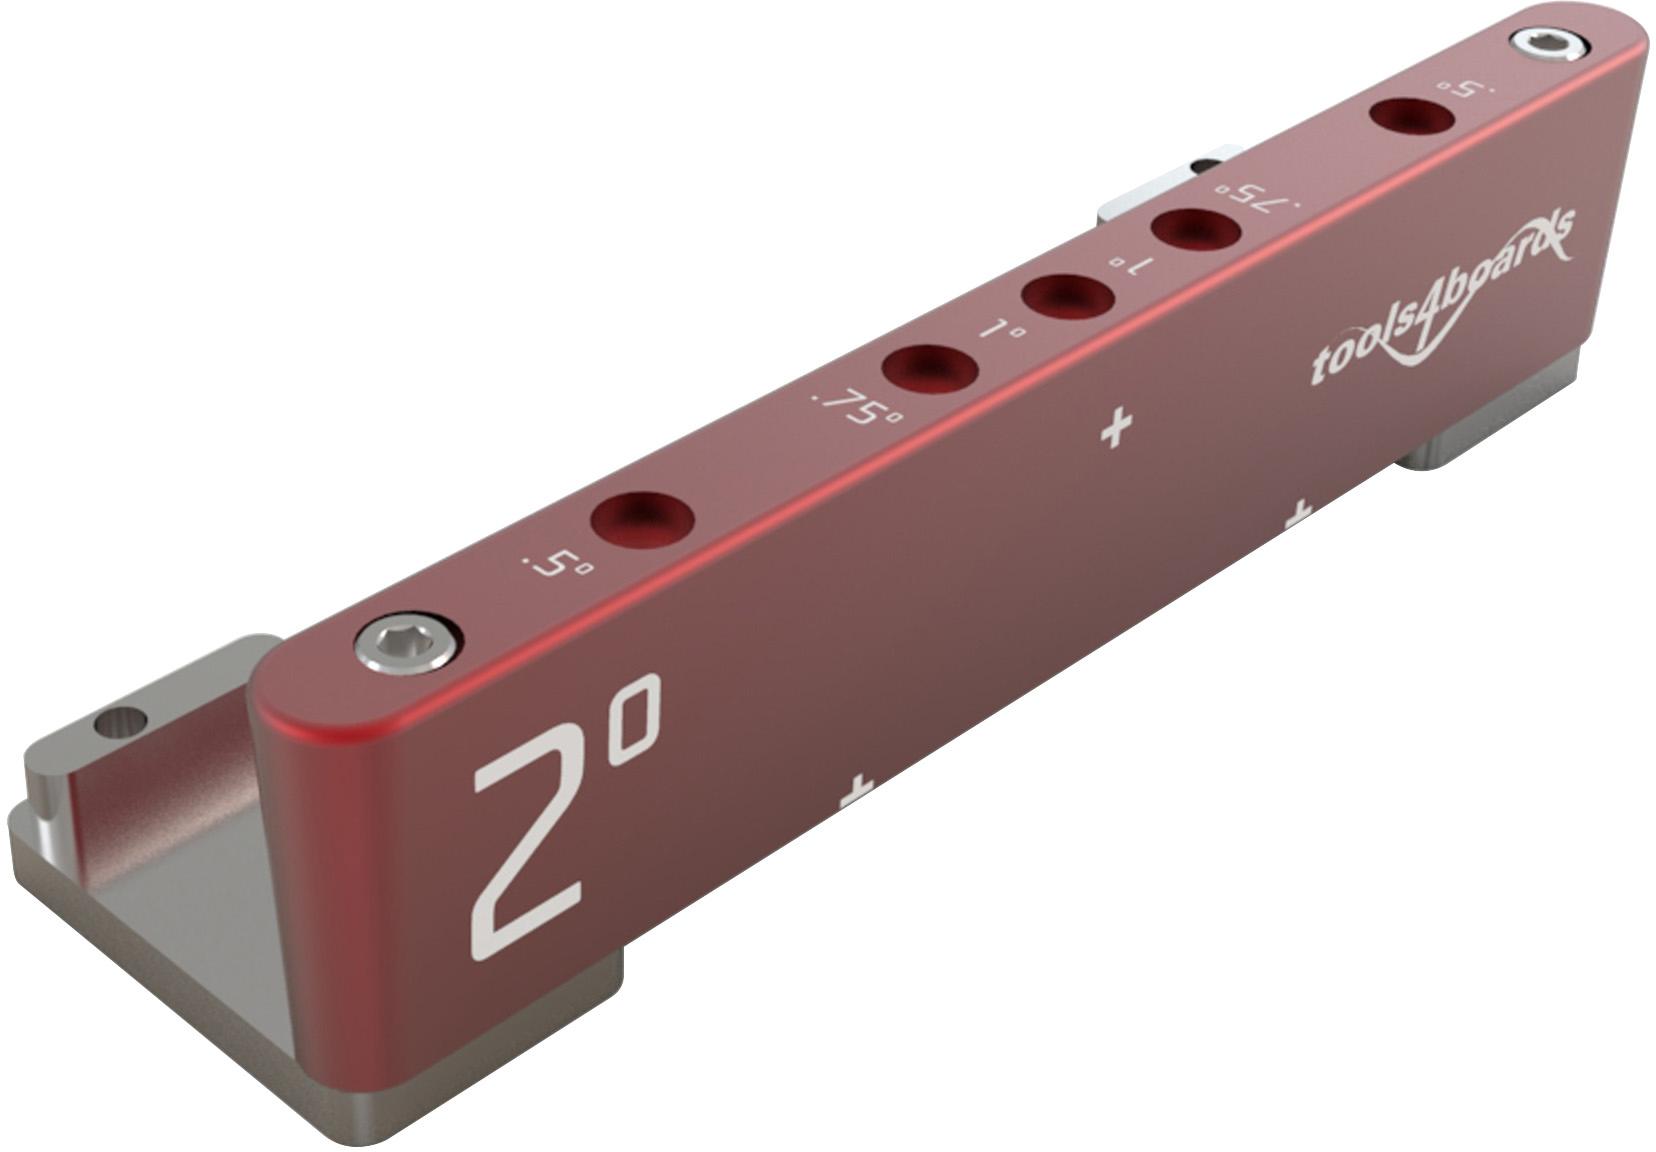 Tools4Boards Switch 0 Degree Green 7 Degree Sidewall Trimmer /& Scraper Sharpener